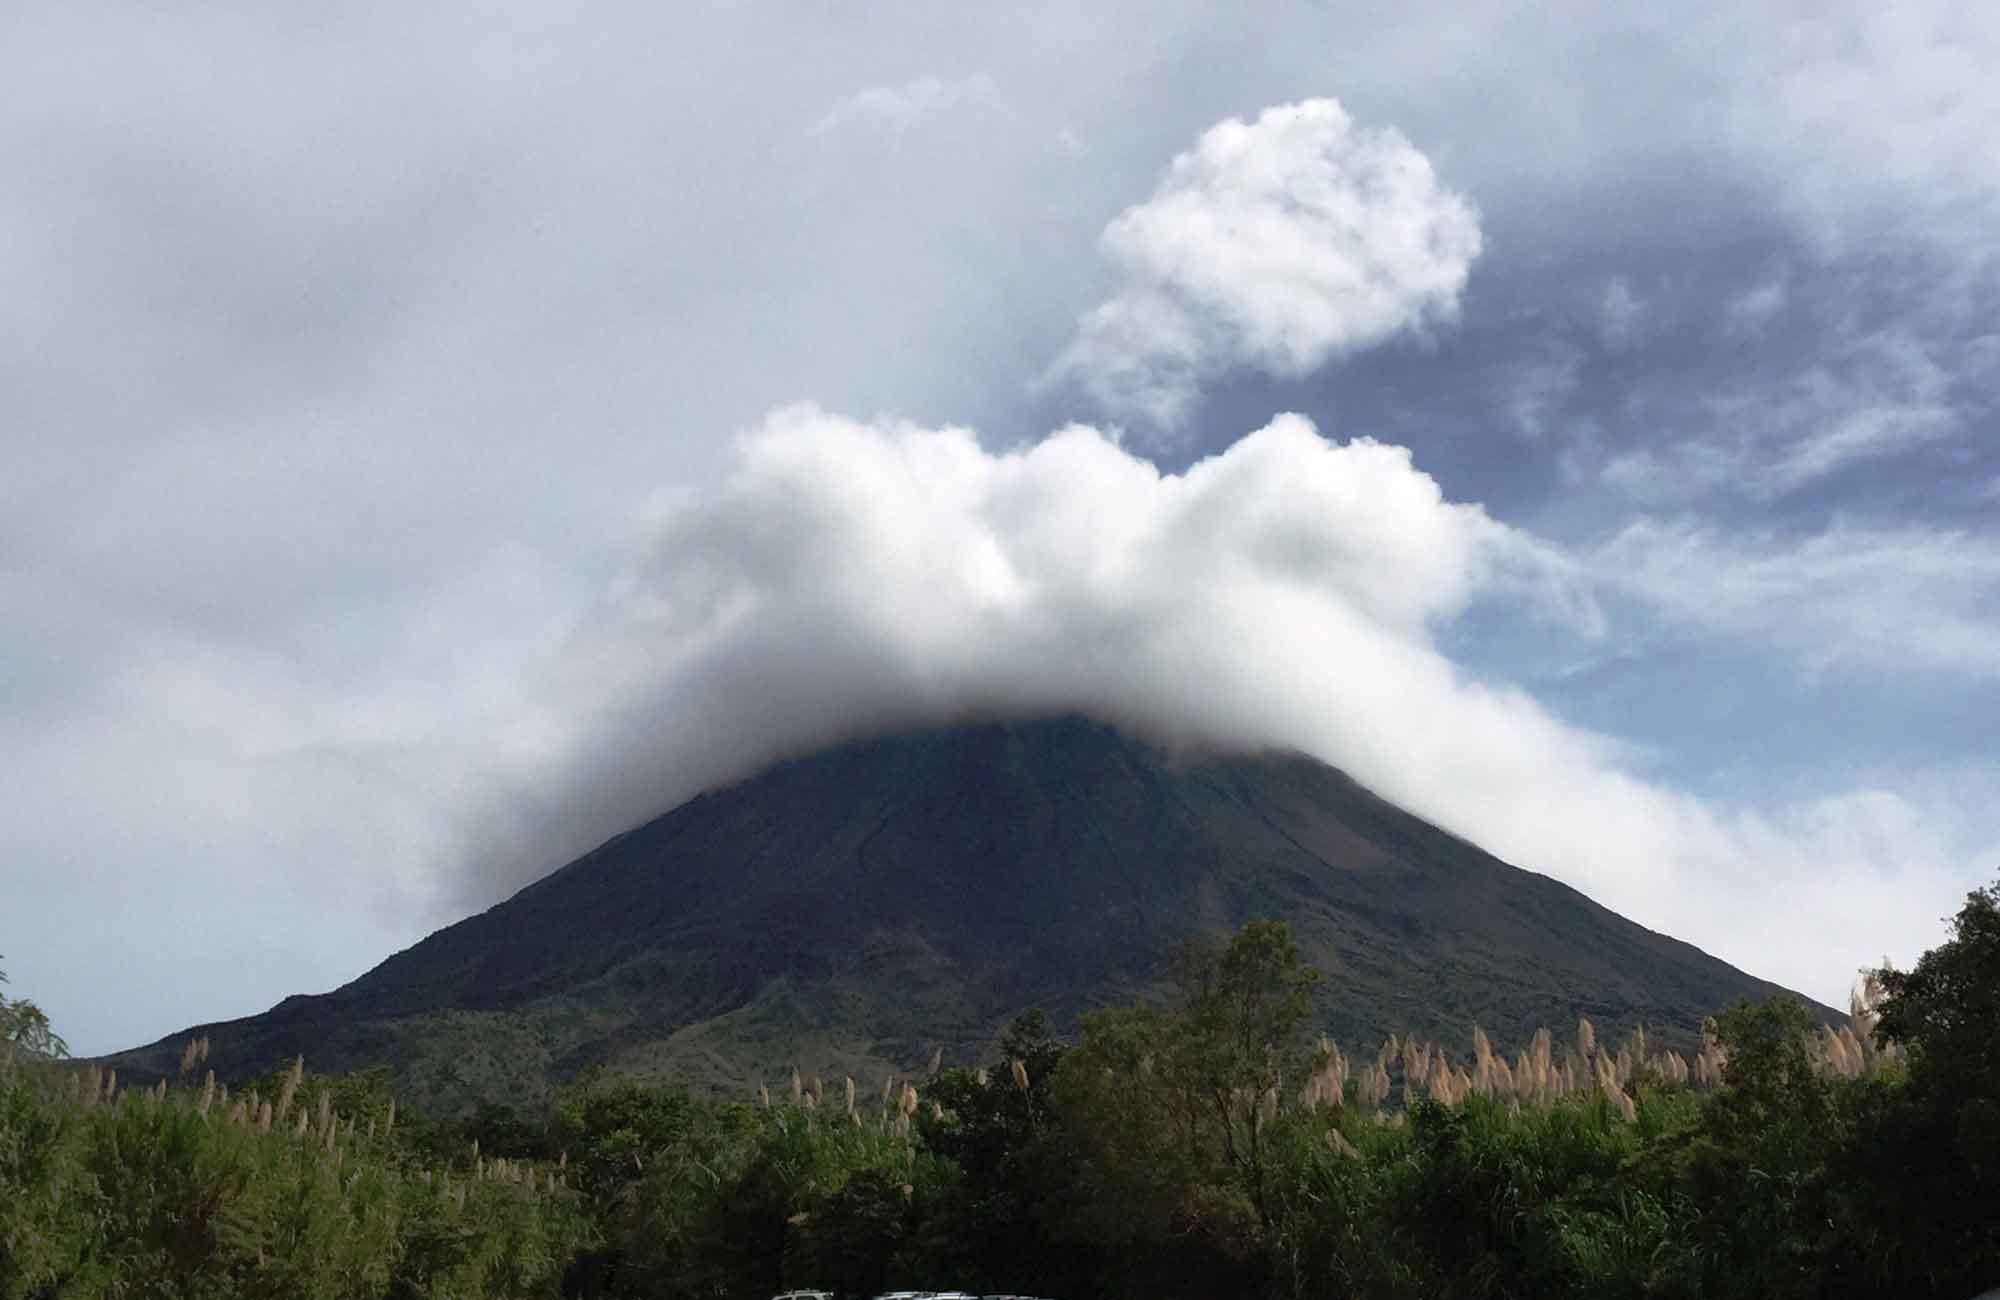 Voyage Costa Rica - Volcan Arenal - Amplitudes